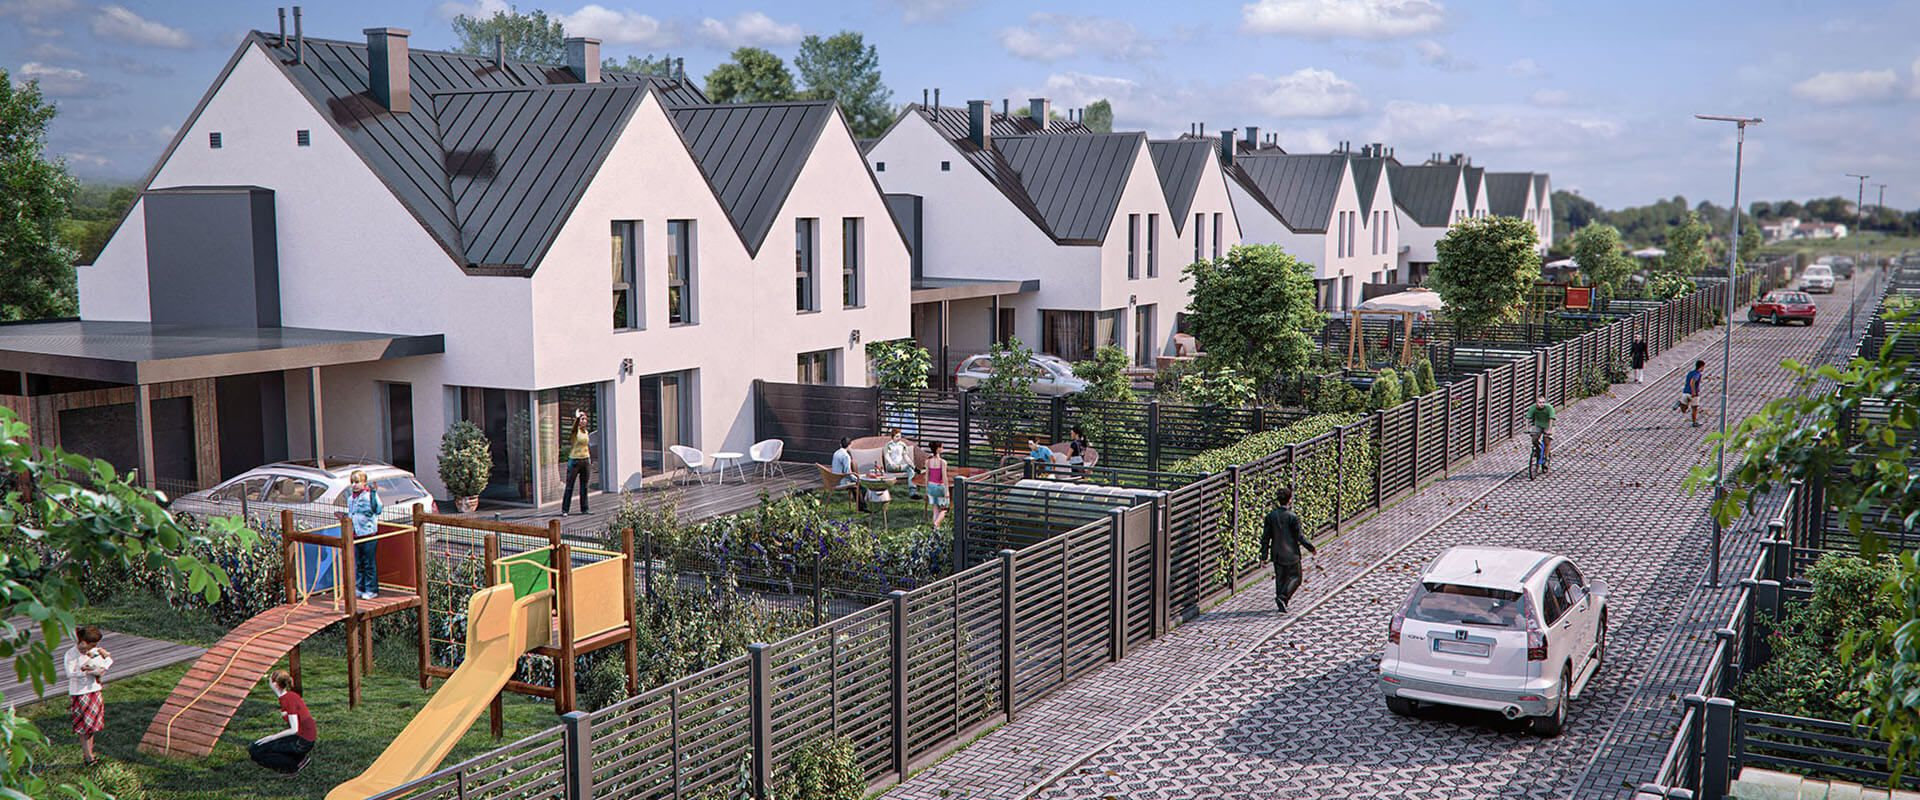 Elegant New Semi-Detached Houses